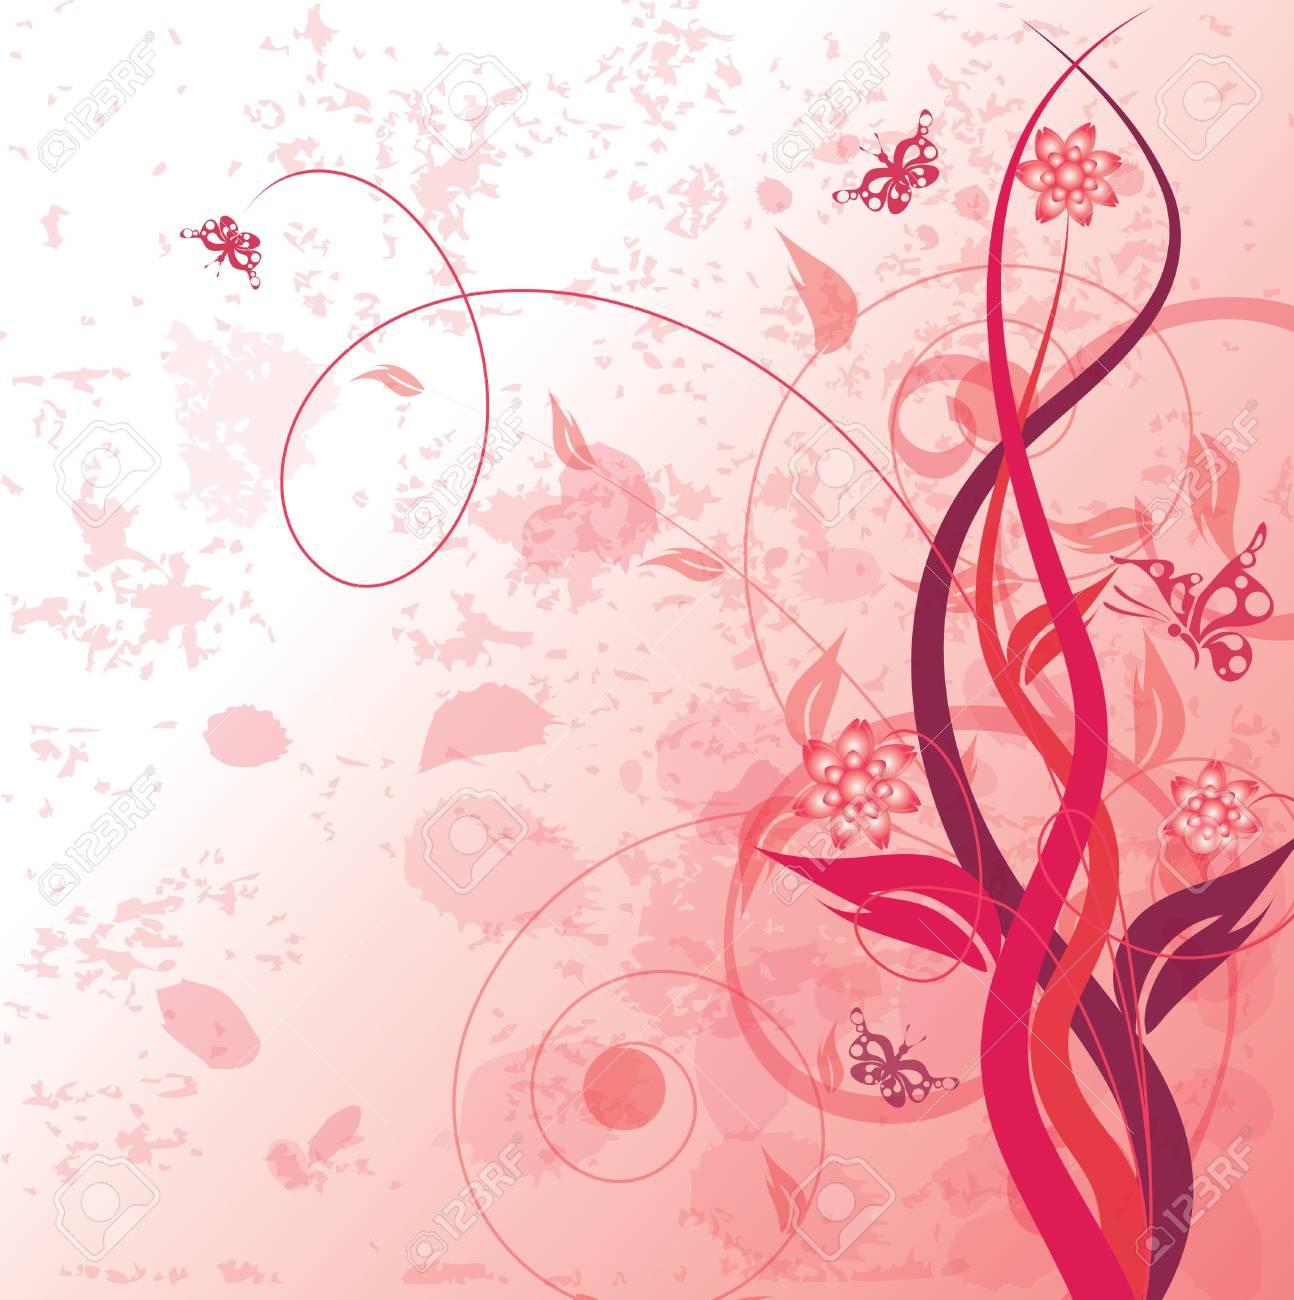 Decorative floral on grunge background, vector illustration Stock Photo - 3610816